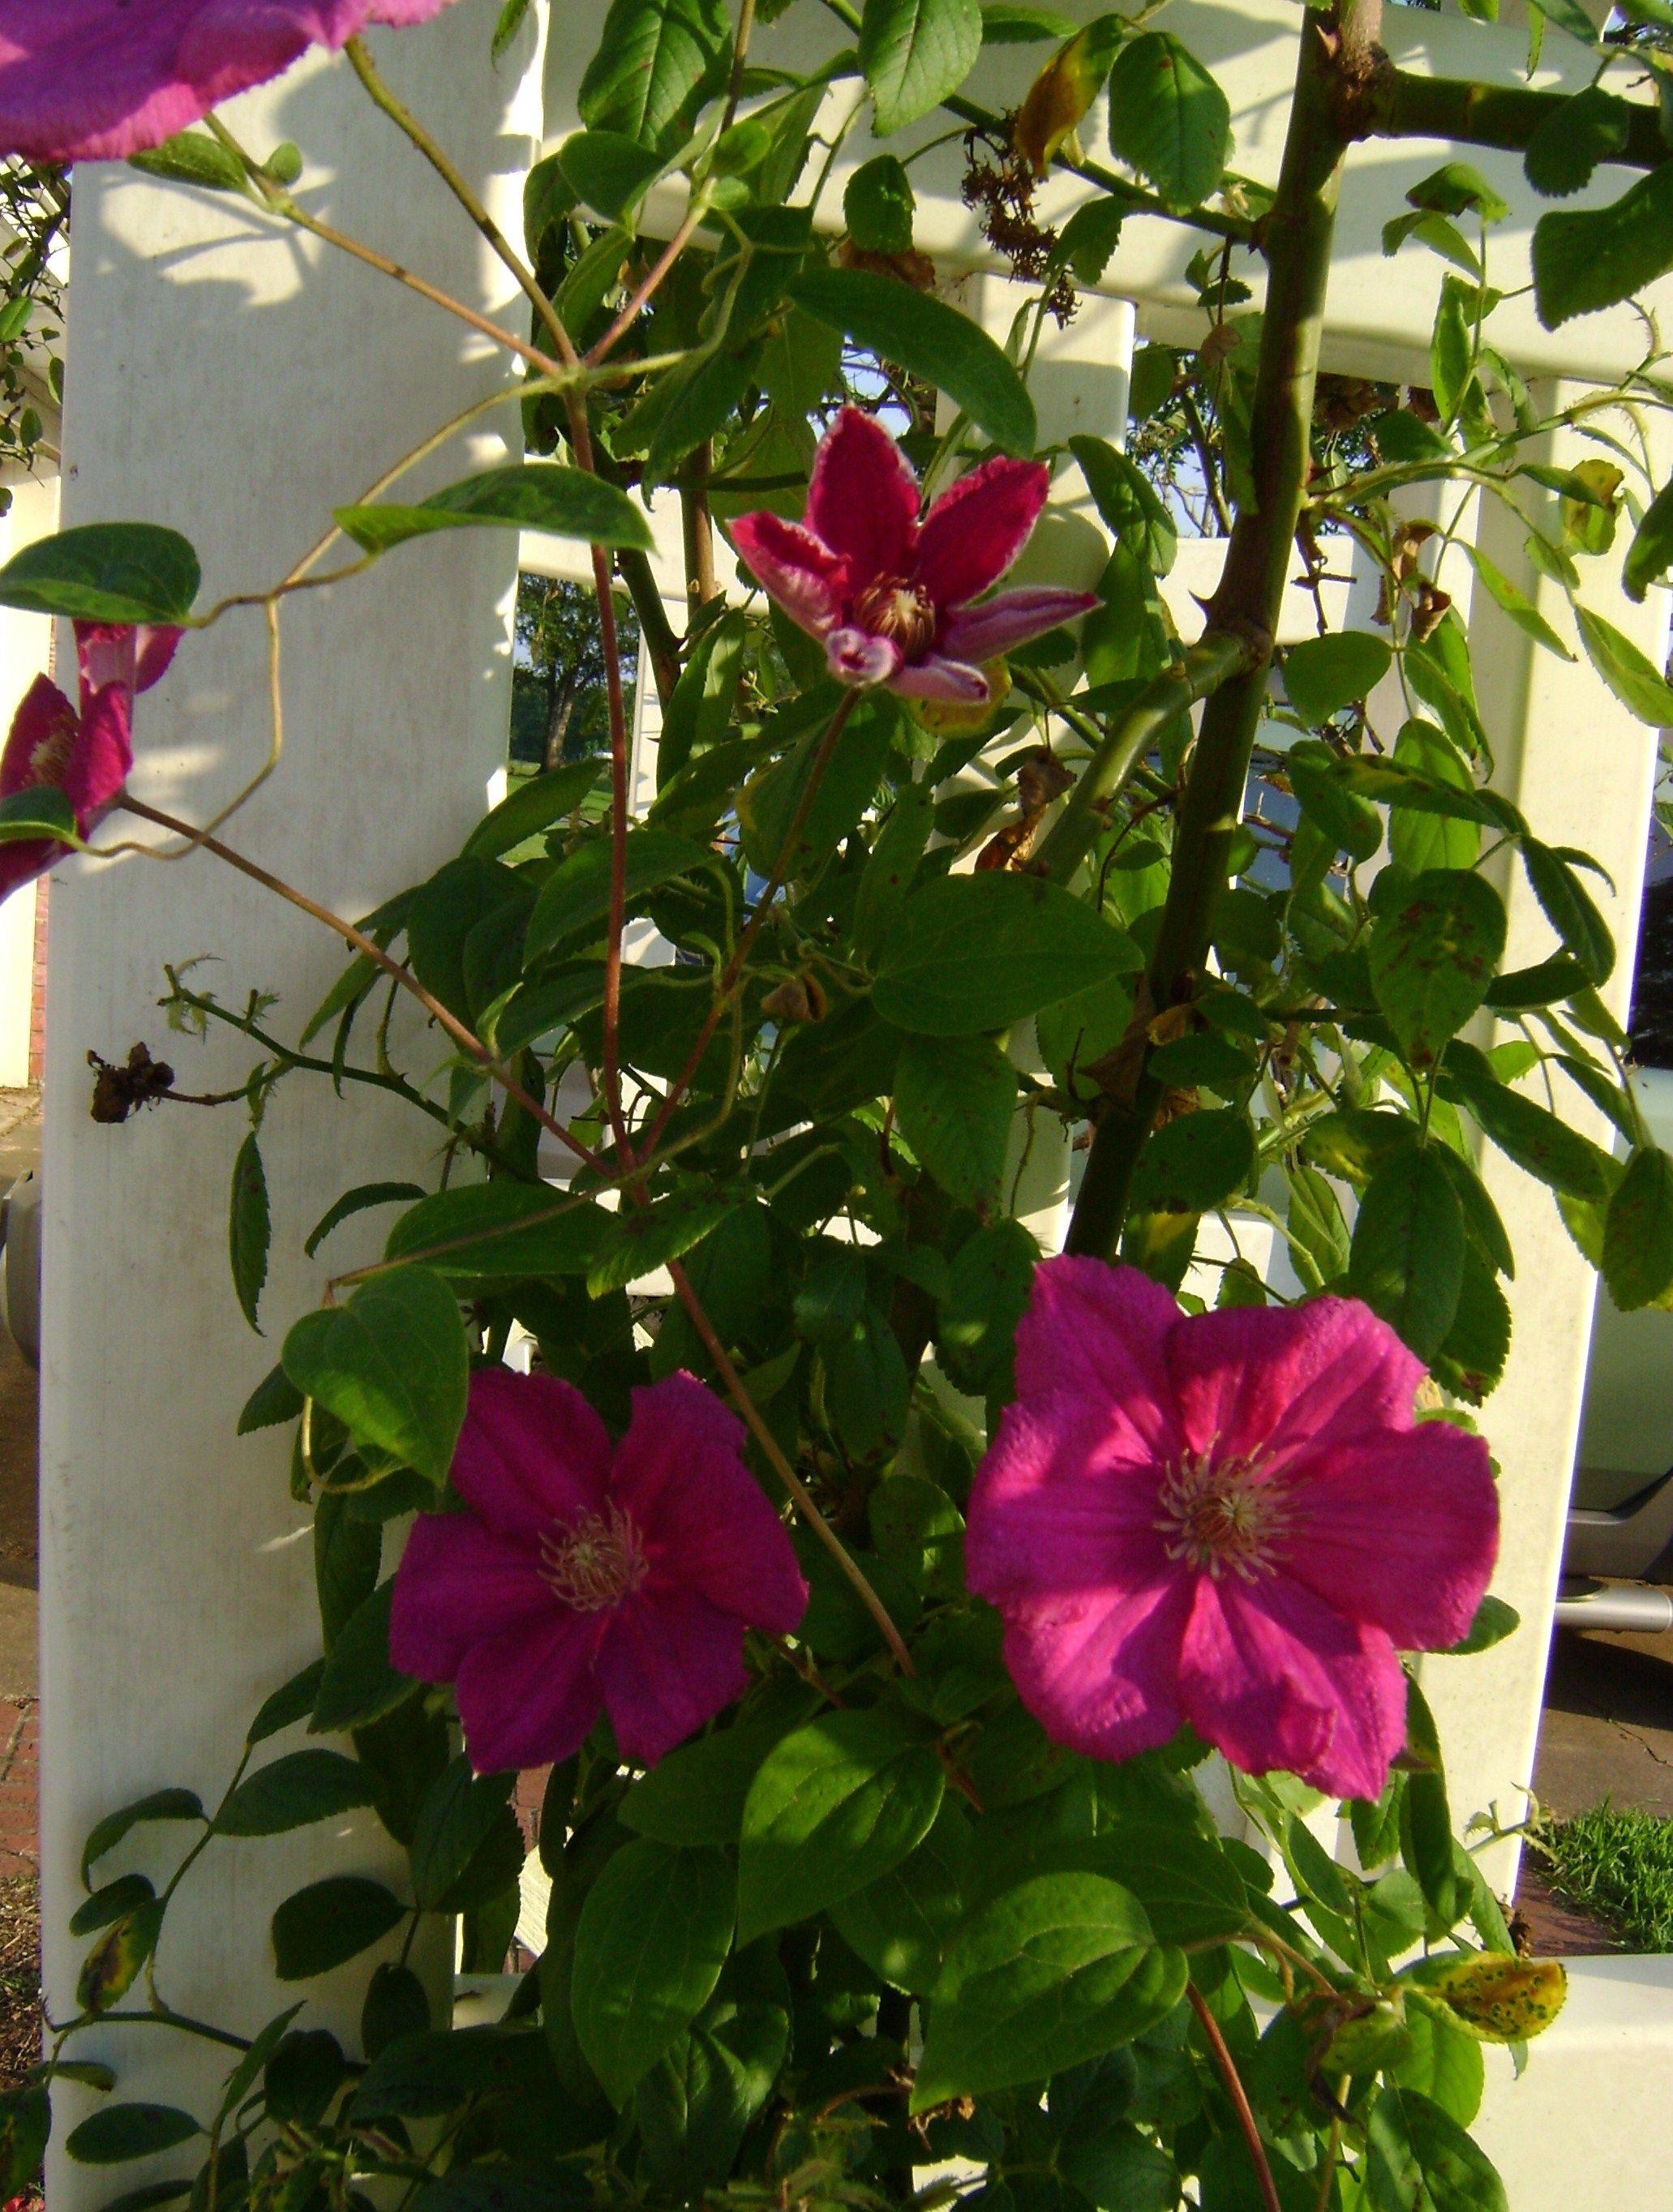 vines on pinterest - photo #4